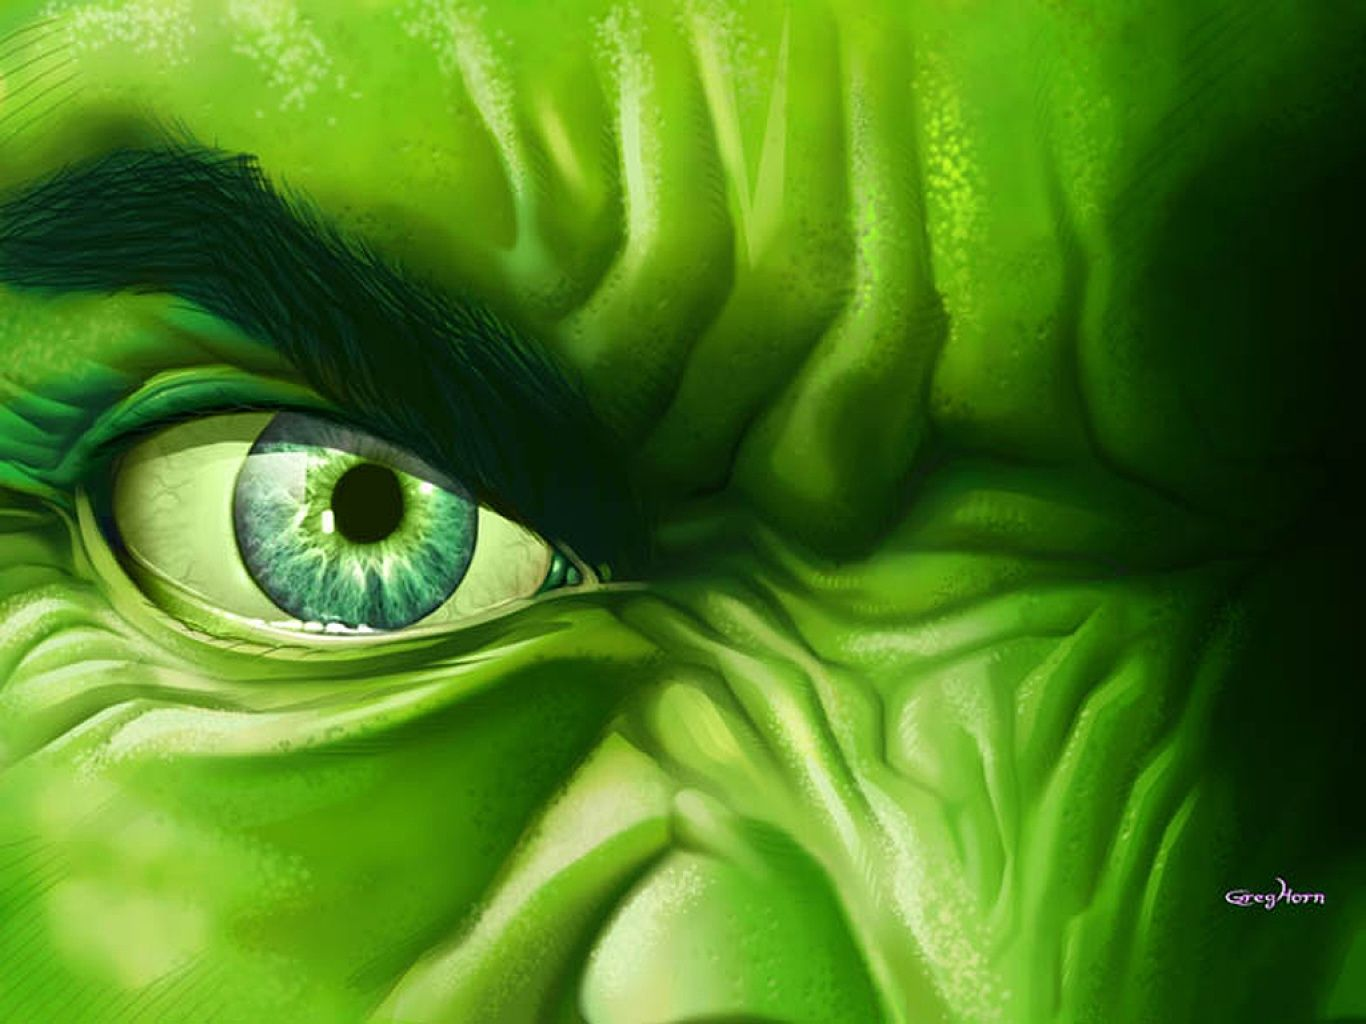 Popular Wallpaper Marvel Face - e25f082de0d02170c099c4d3f5a91c17  Gallery_879468.jpg